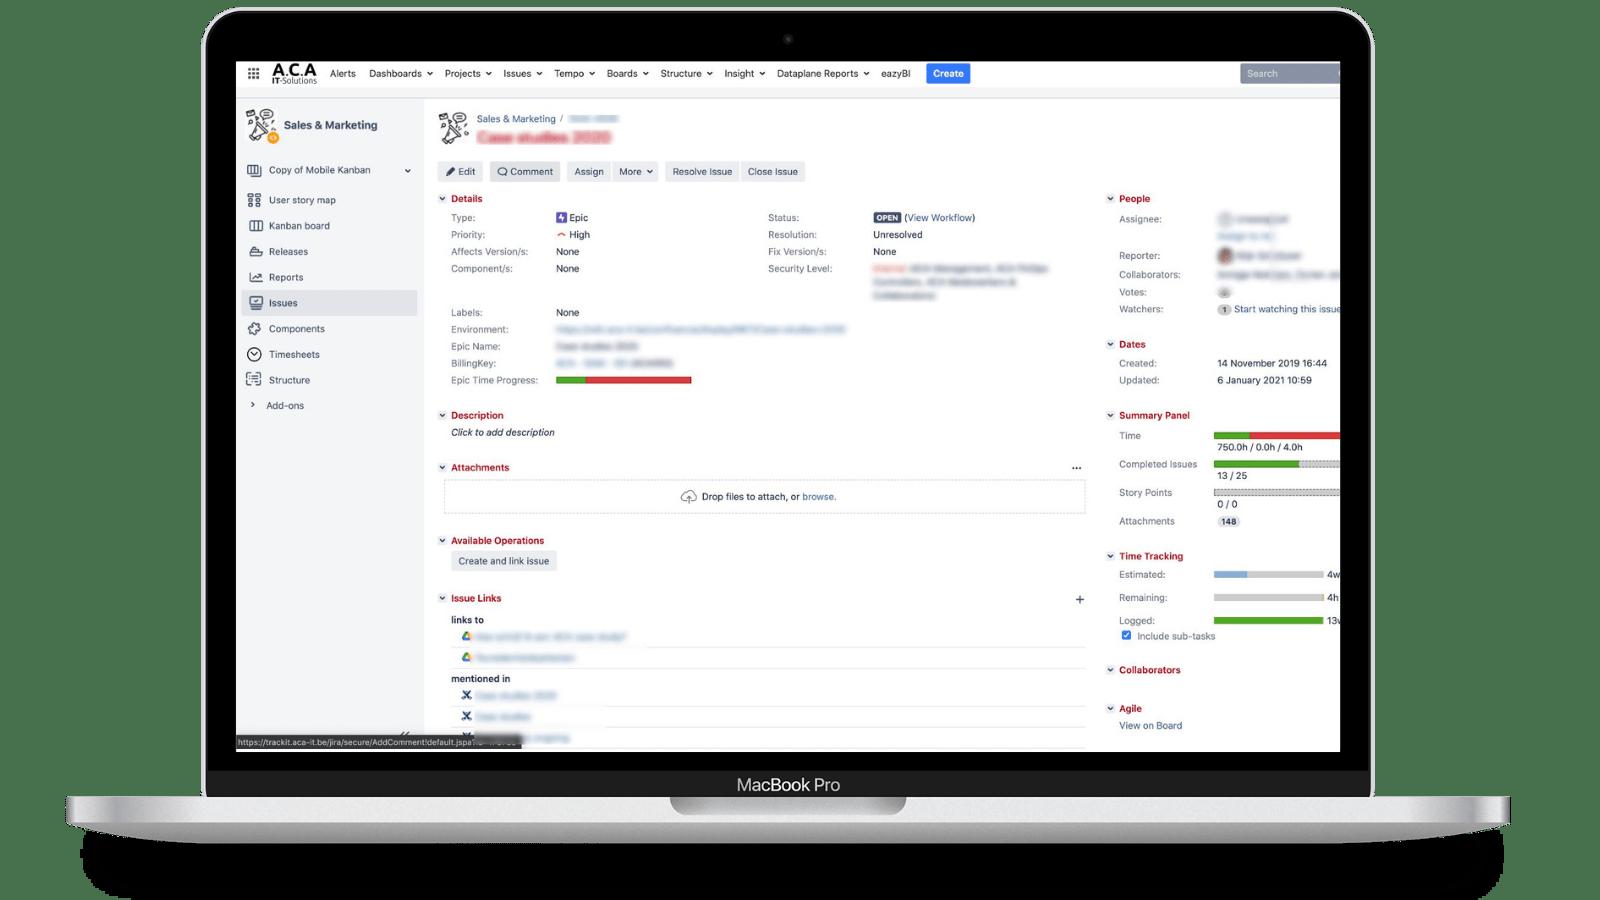 macbook mockup jira software management